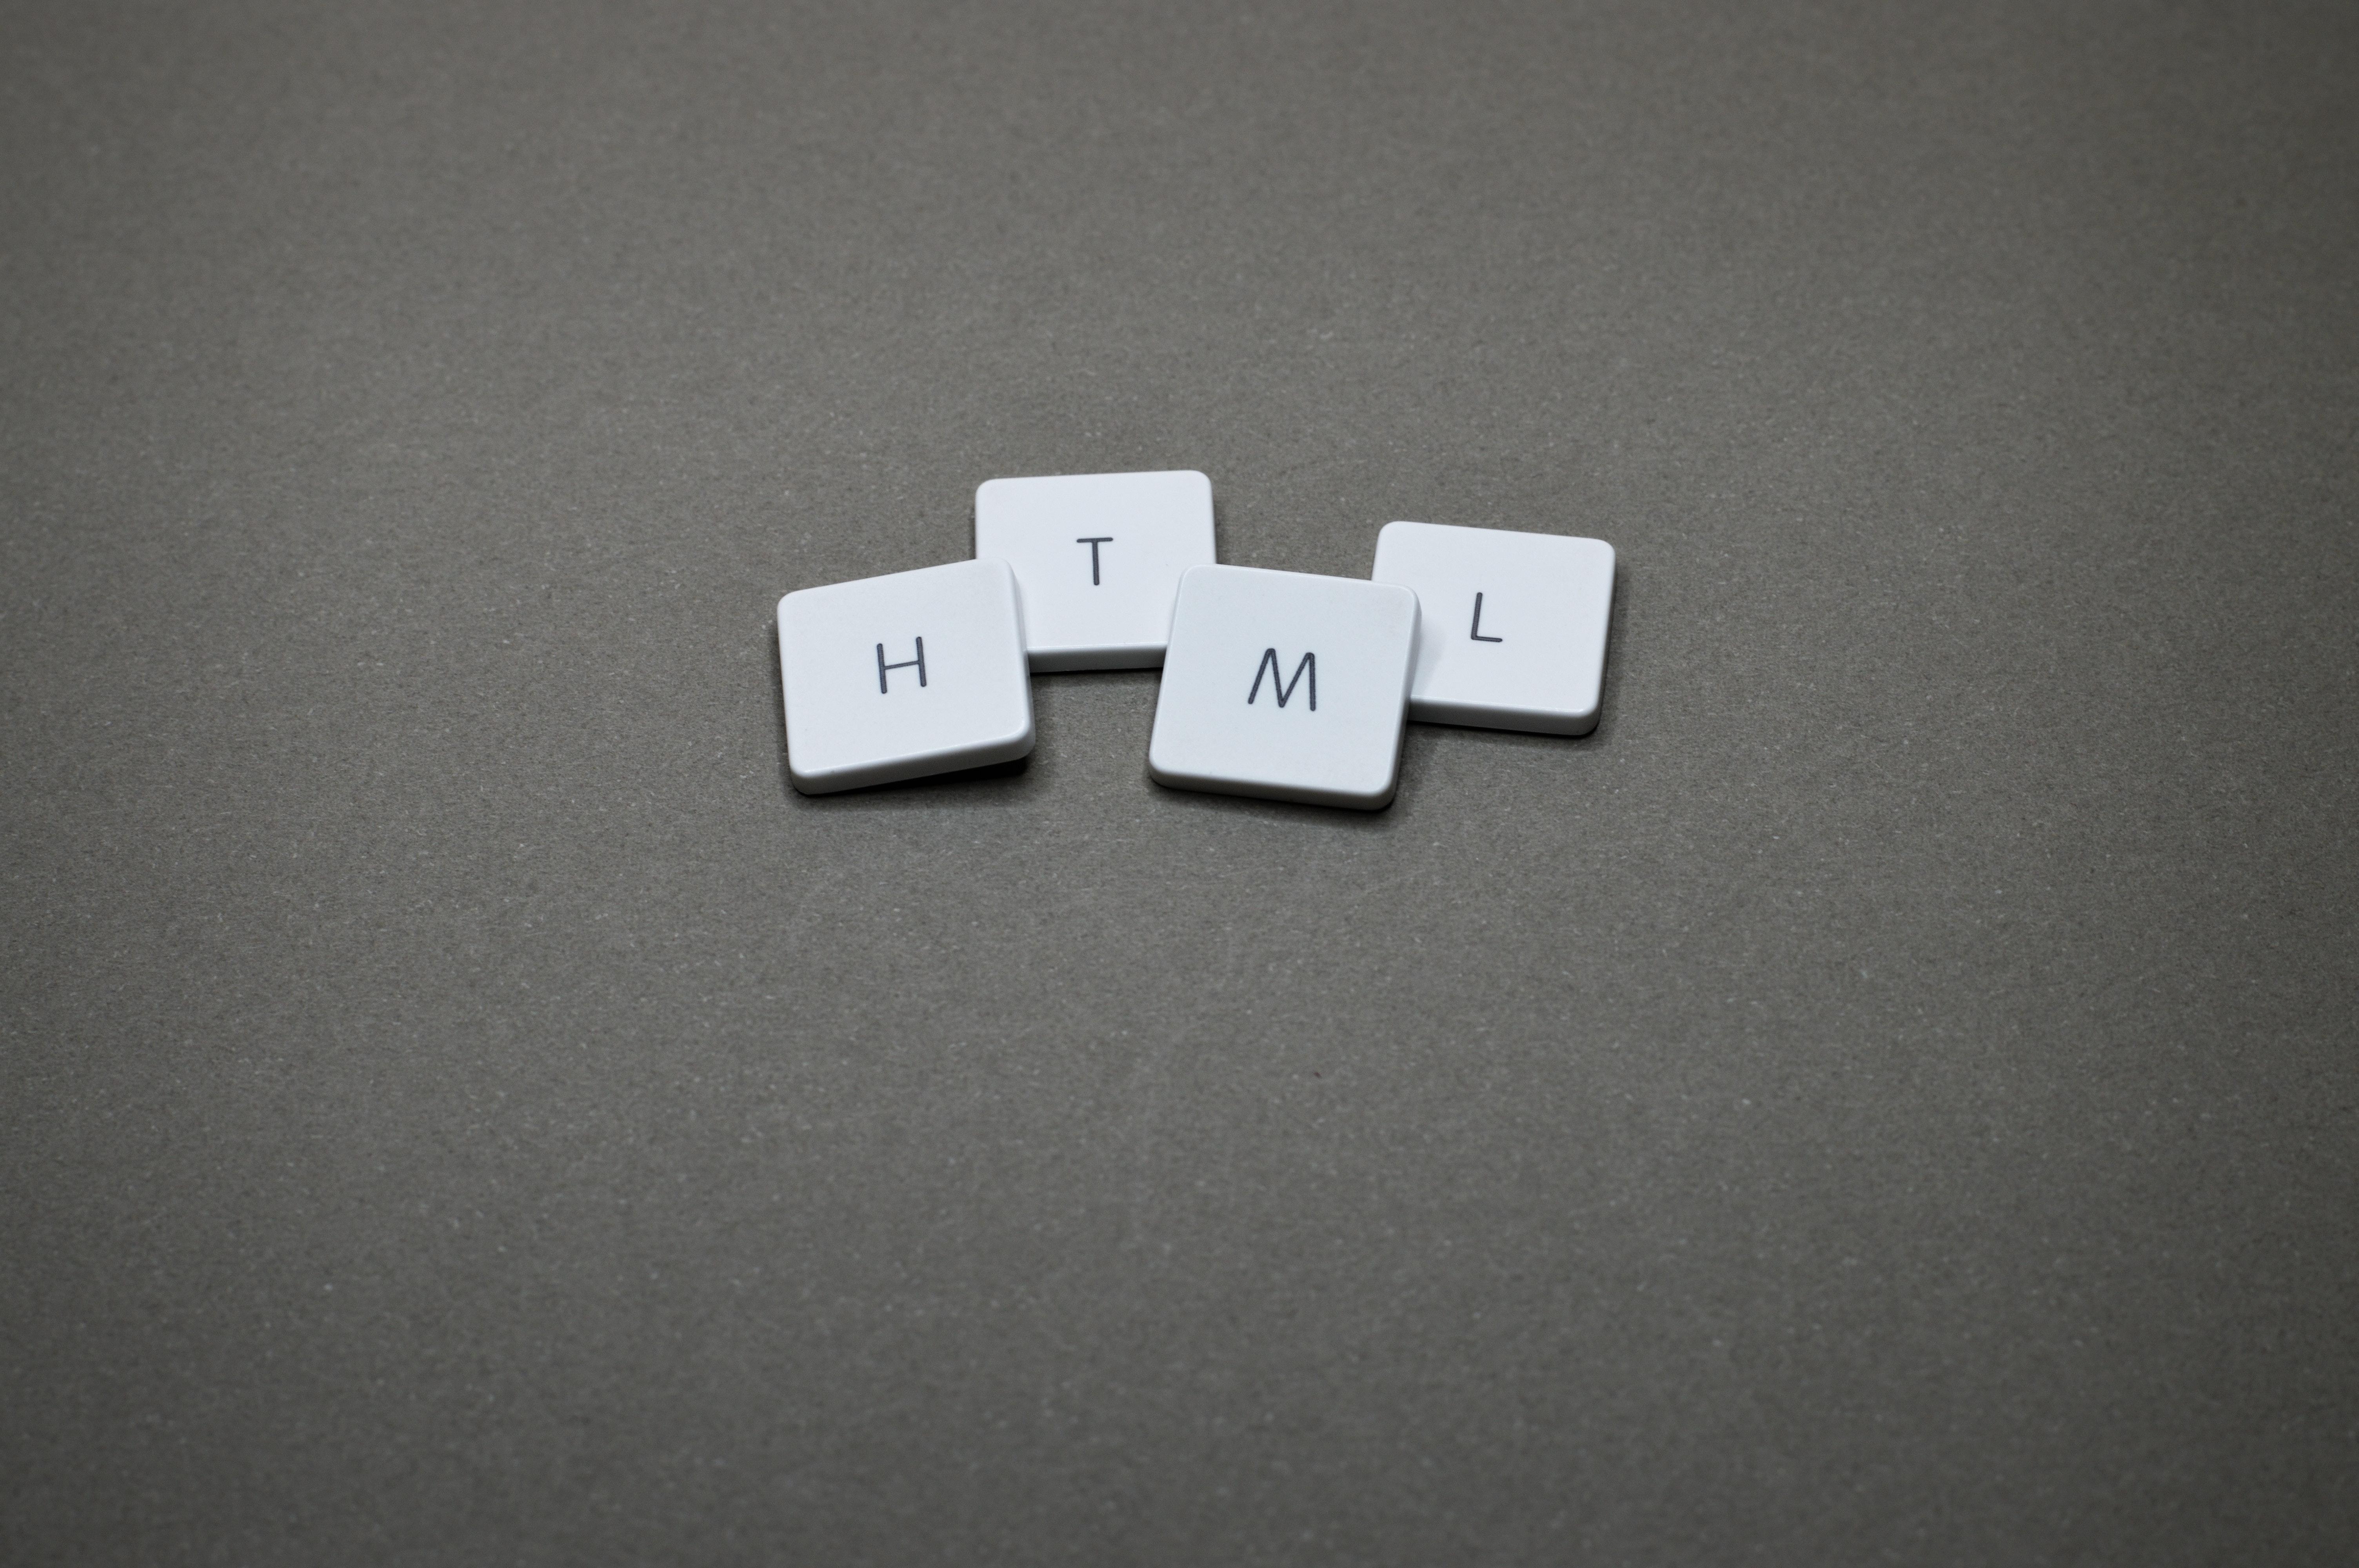 konseptual pendidikan permainan Internet huruf pesan bentuk kotak teks kata